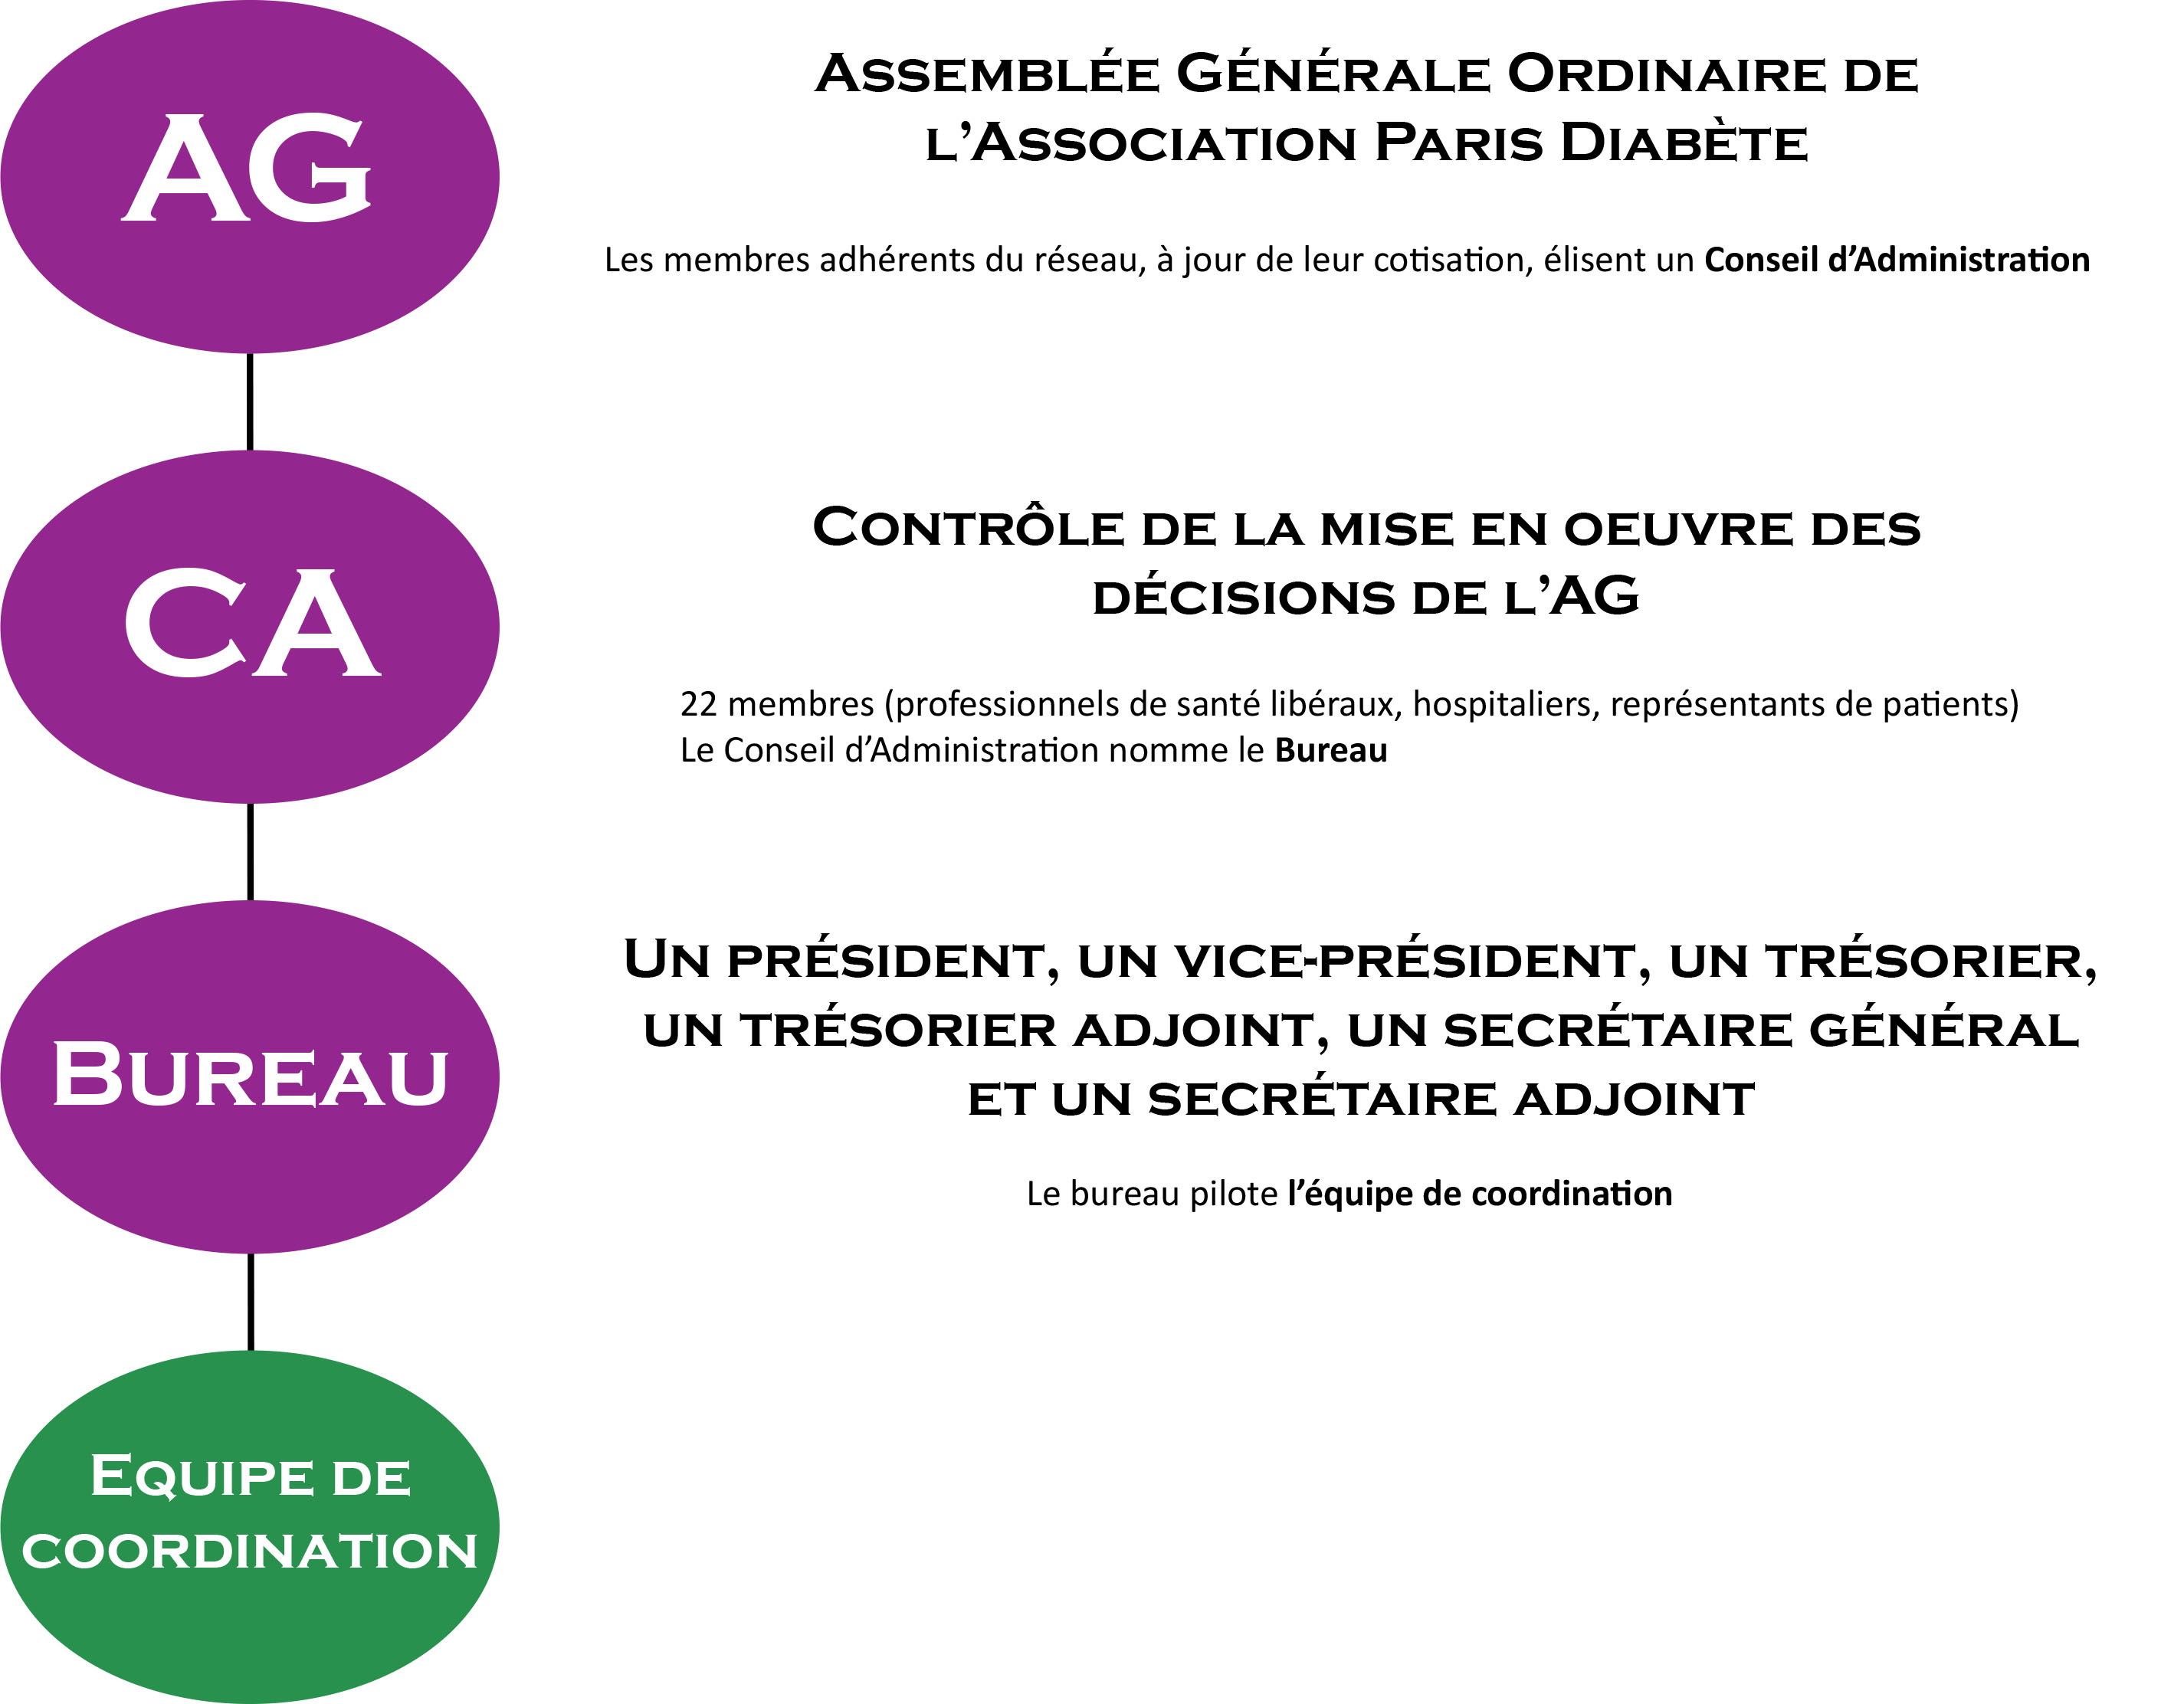 organigramme organisation Paris Diabète